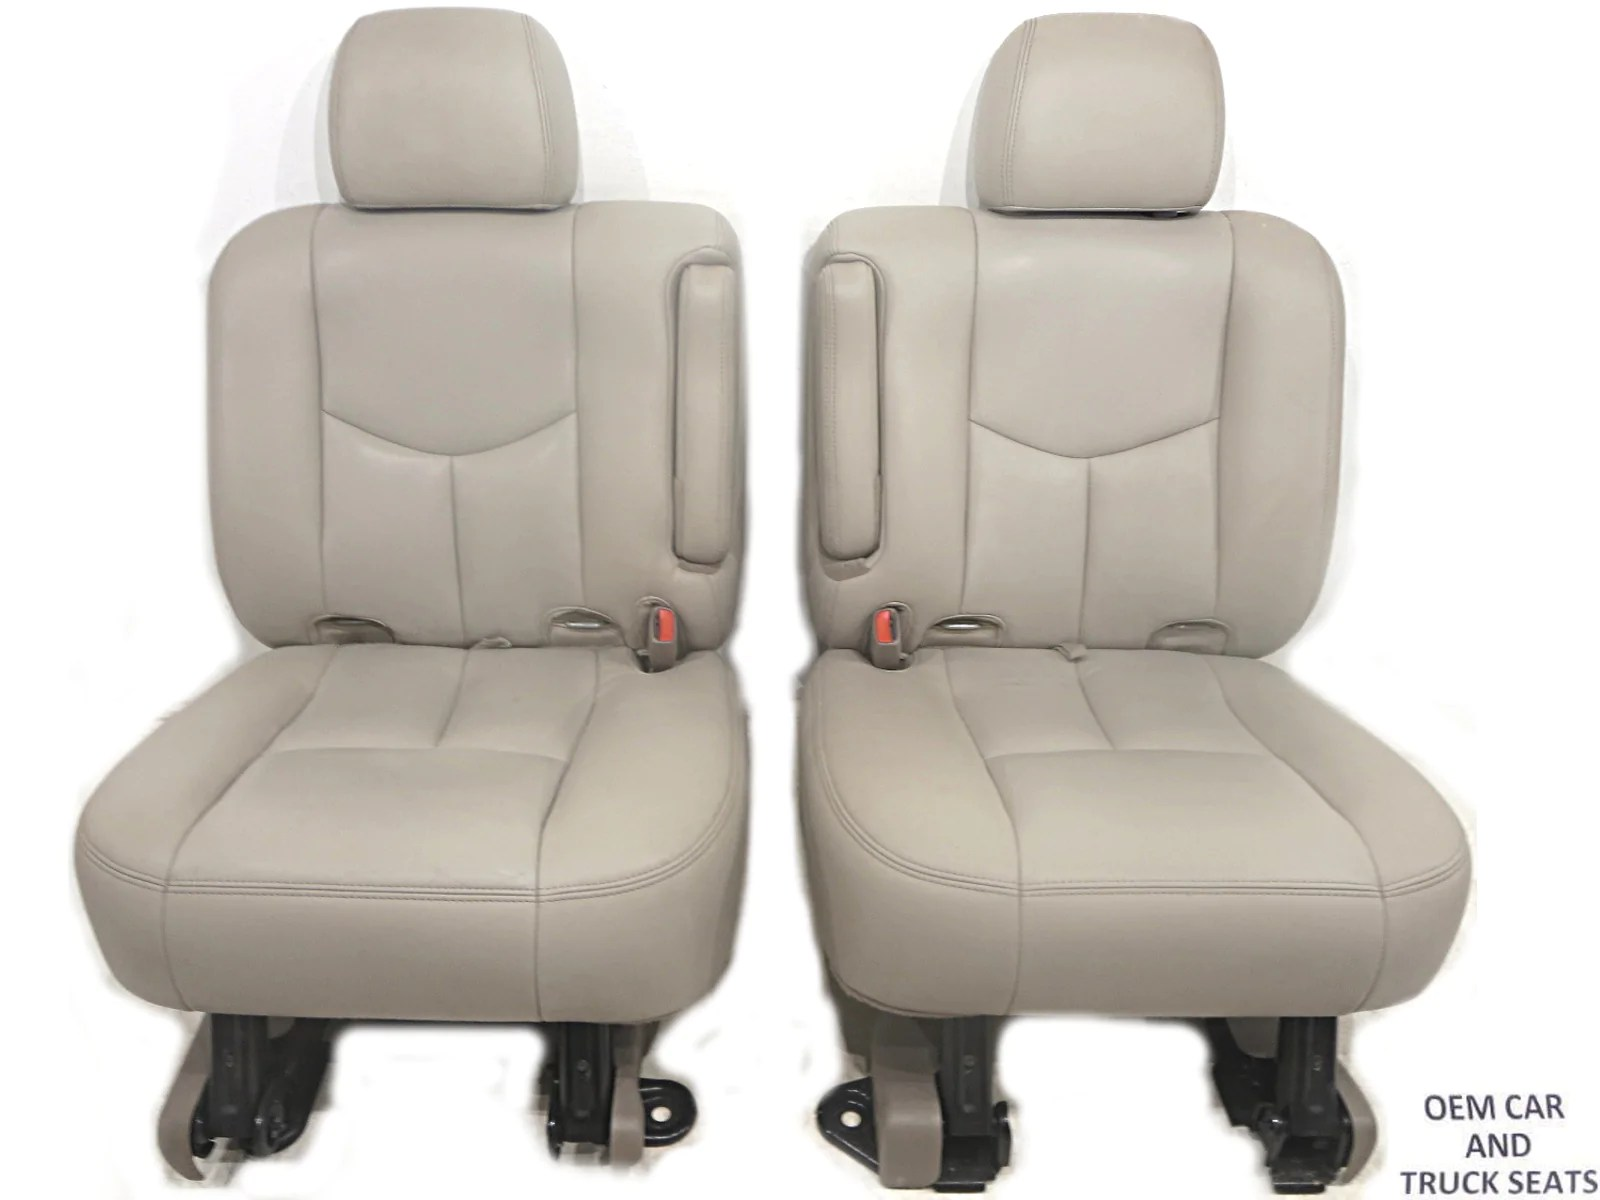 gm suburban oem rear leather bucket seats 2000 2001 2002 2003 2004 2005 2006  [ 1600 x 1200 Pixel ]